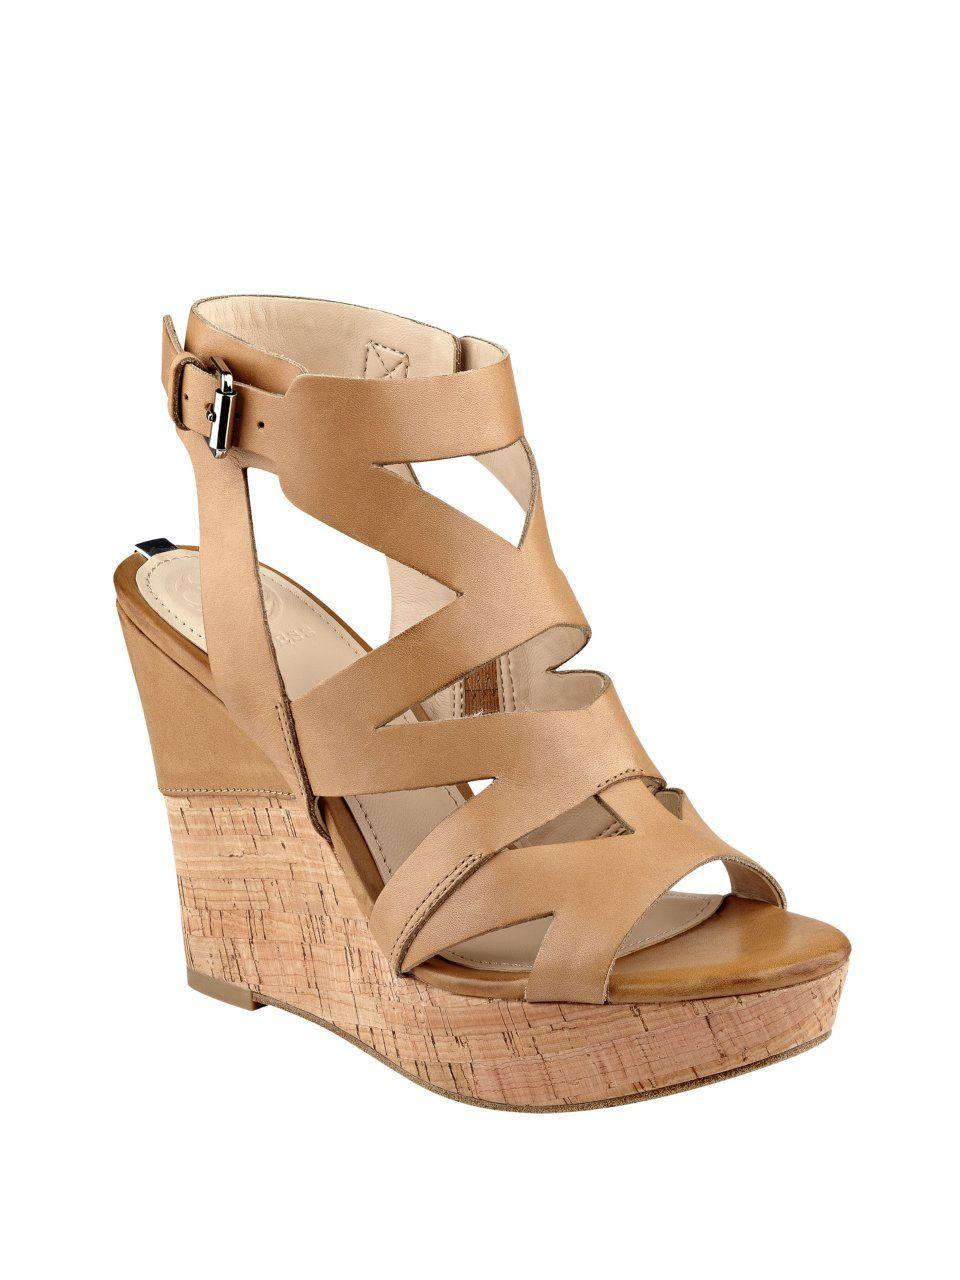 17fb05fc48bcd Hannele Cork Wedges   Products   Wedge sandals, Cork wedges y Wedges